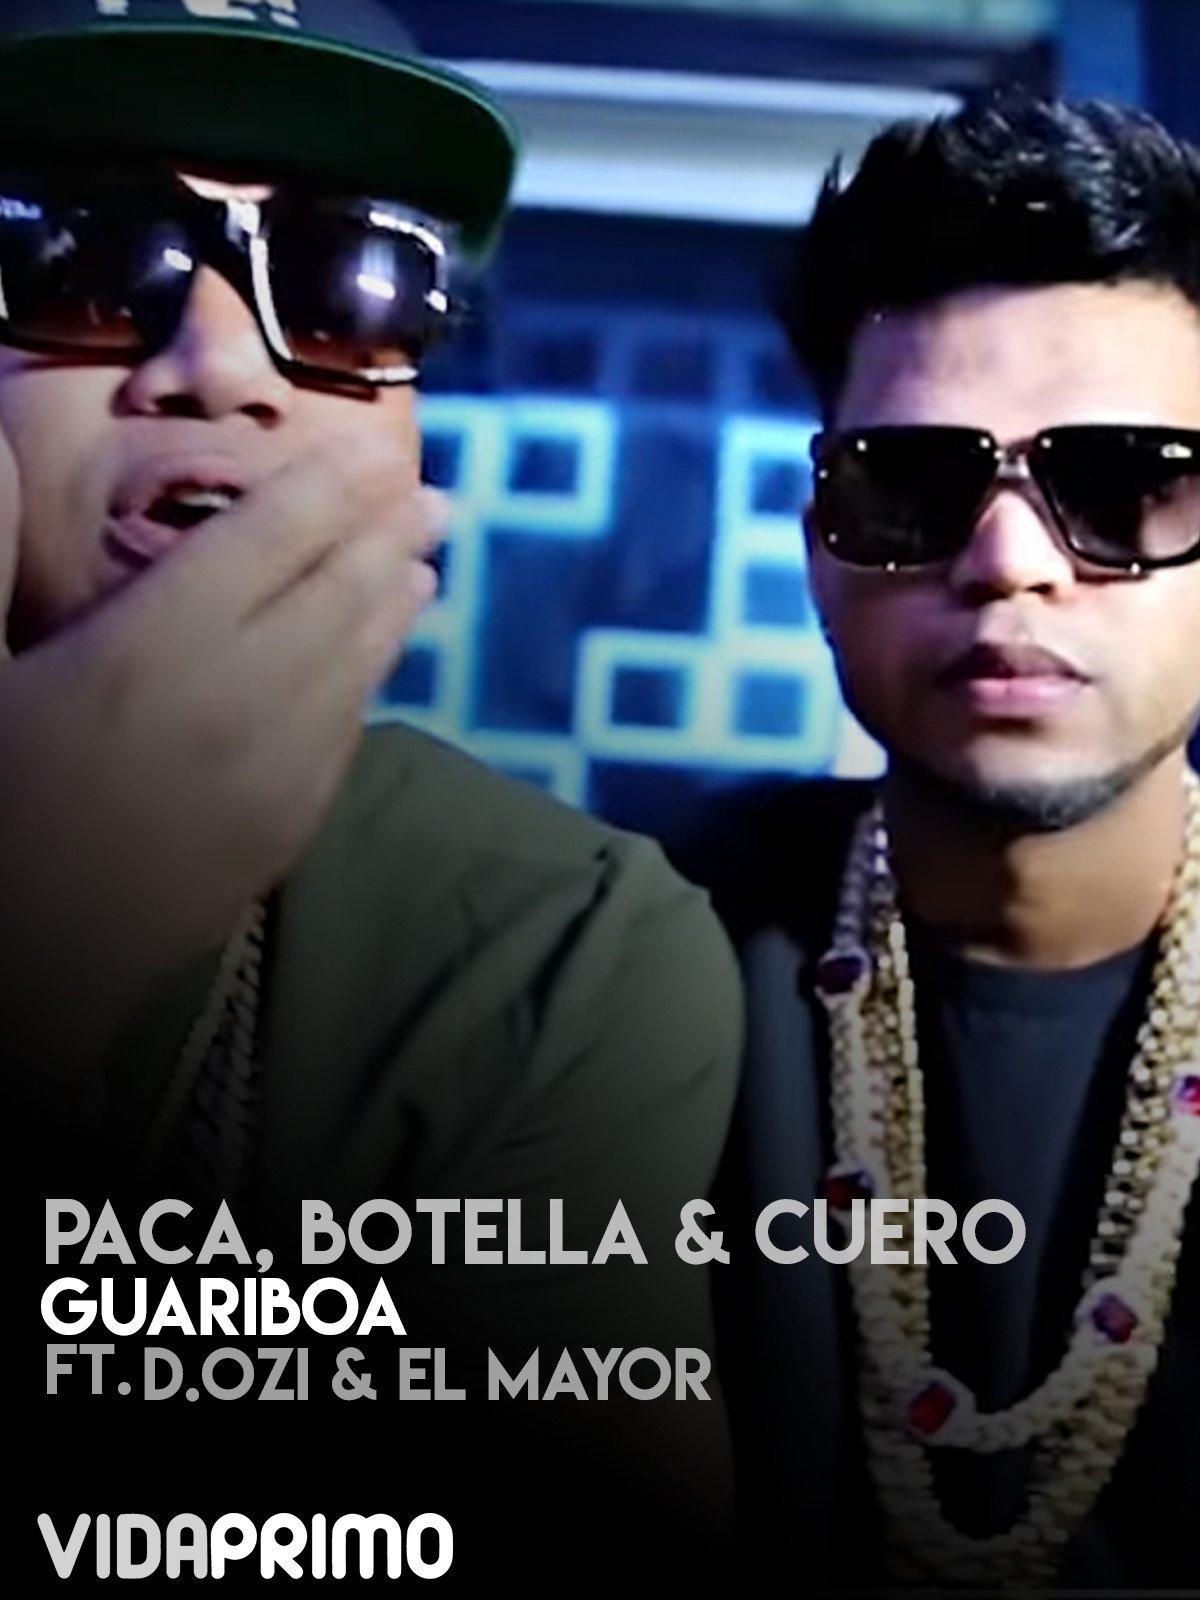 Paca, Botella & Cuero